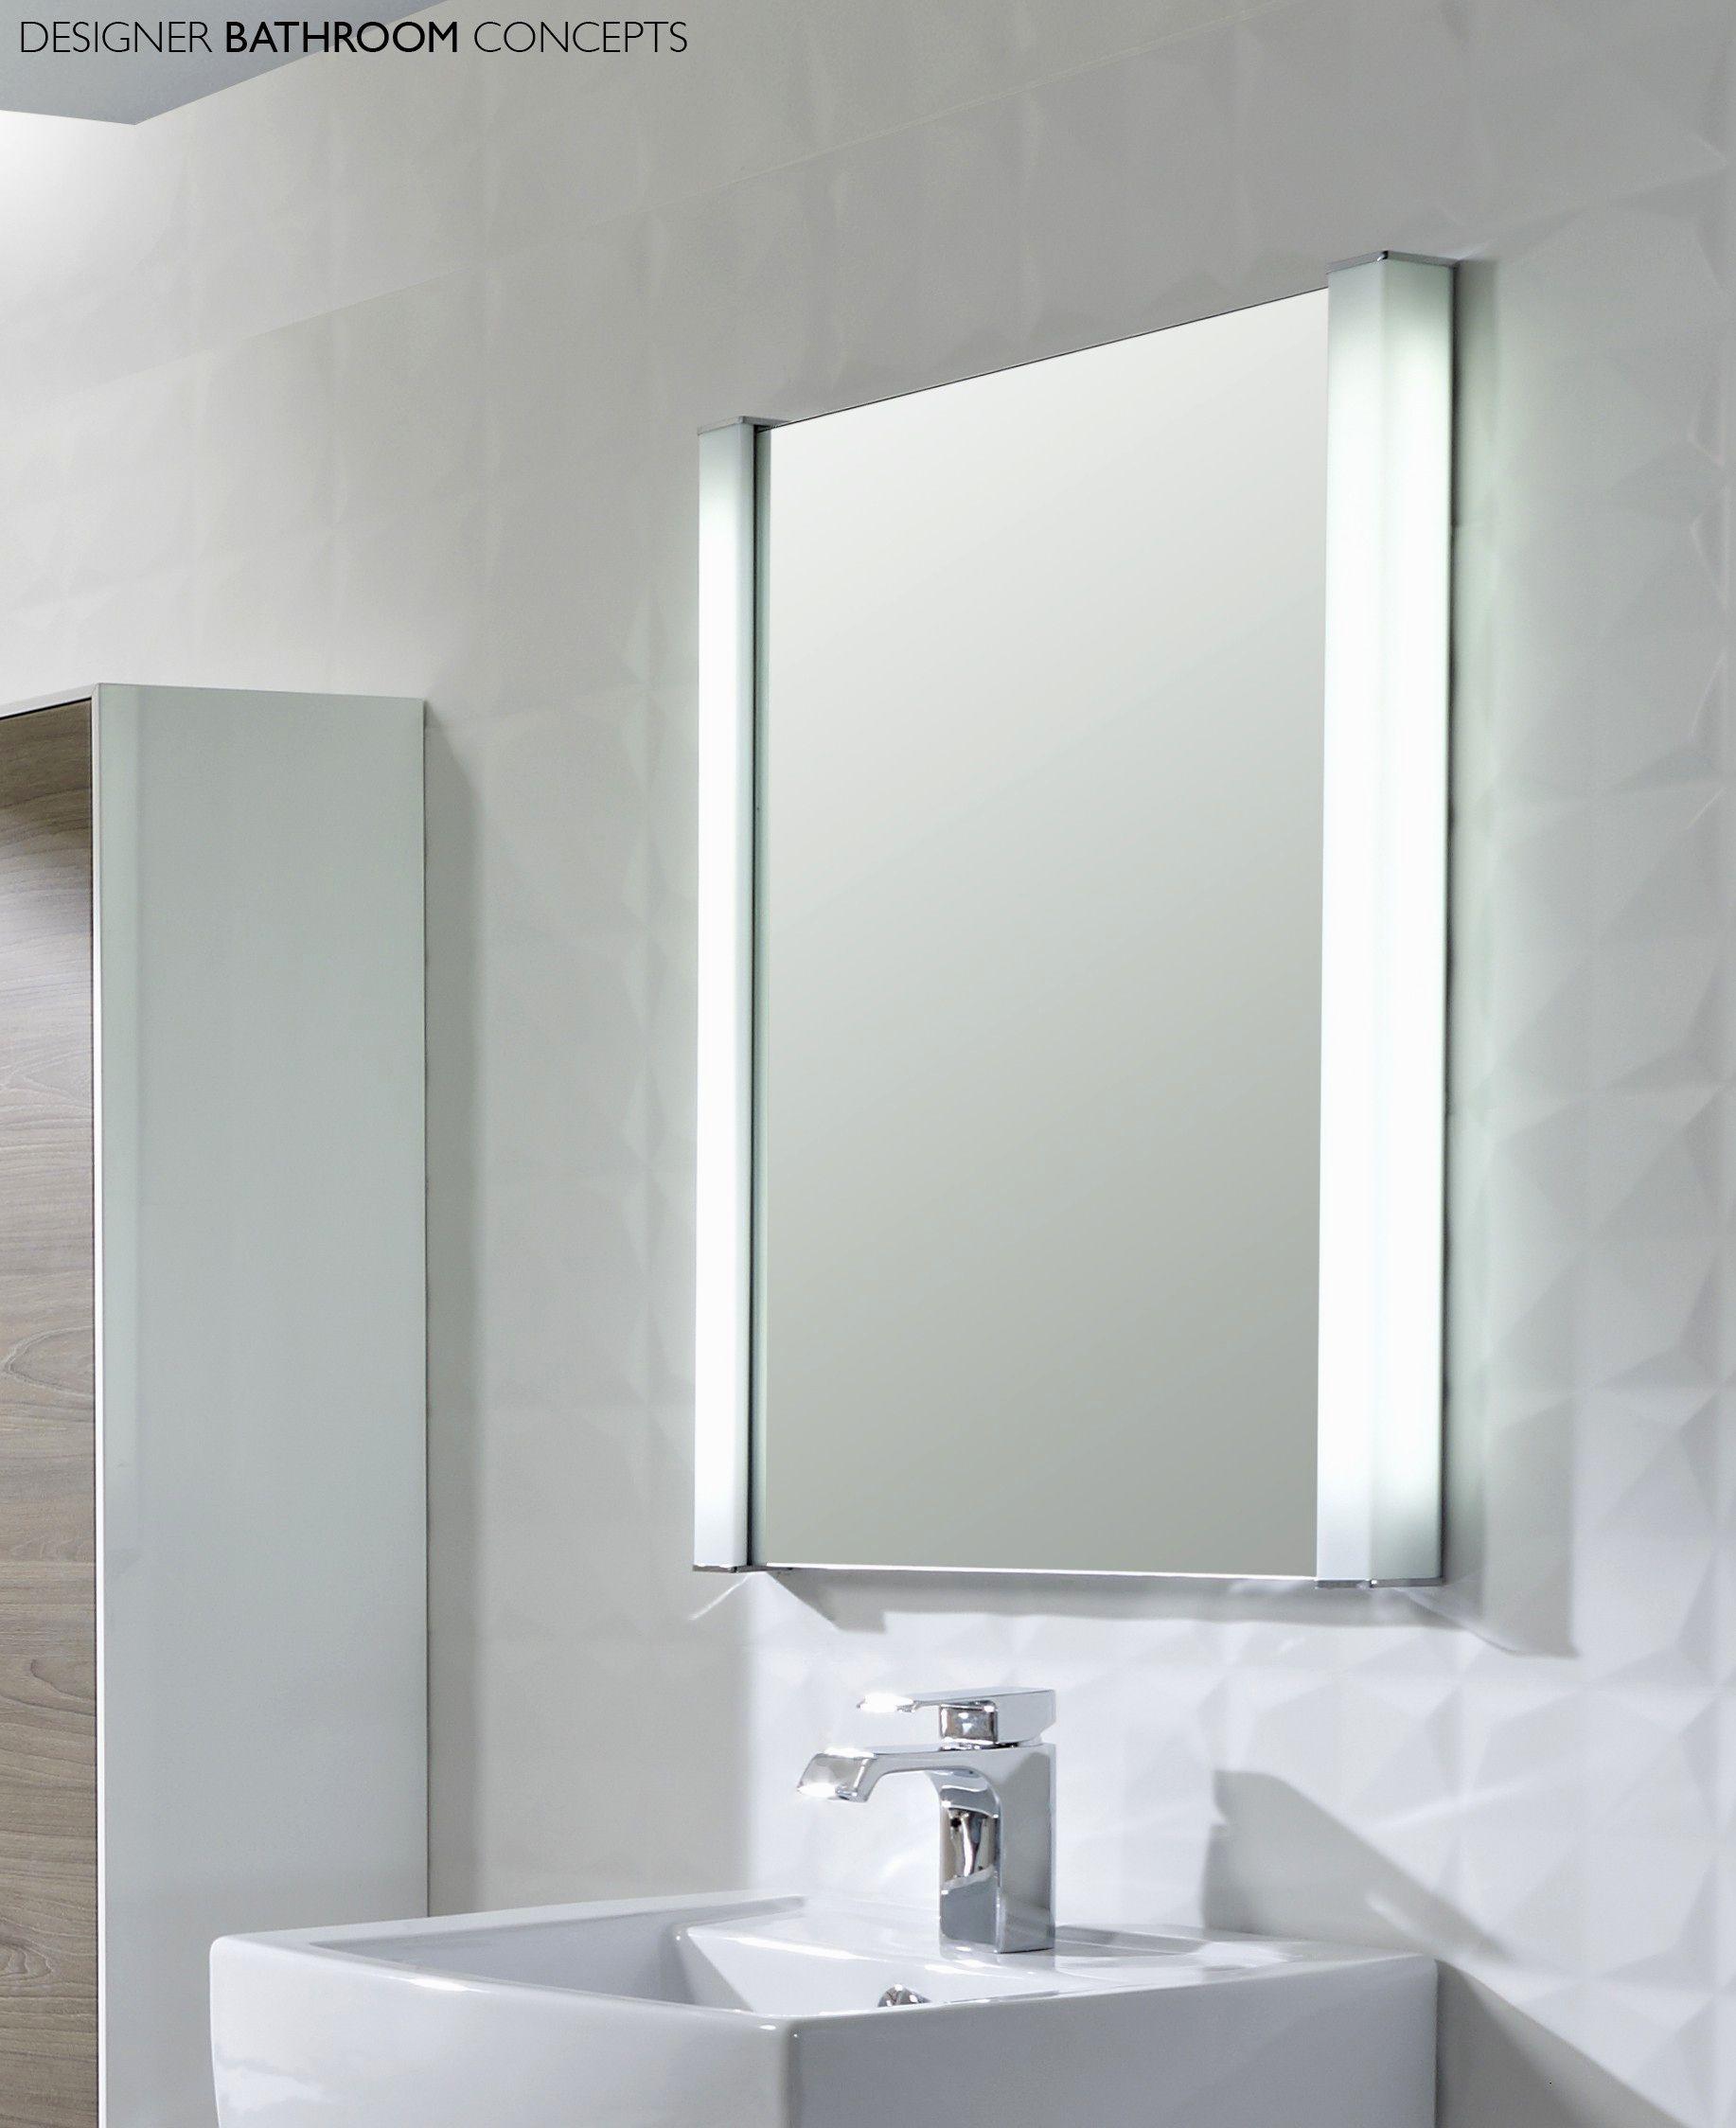 best of how to make a bathroom vanity photograph-Amazing How to Make A Bathroom Vanity Photo